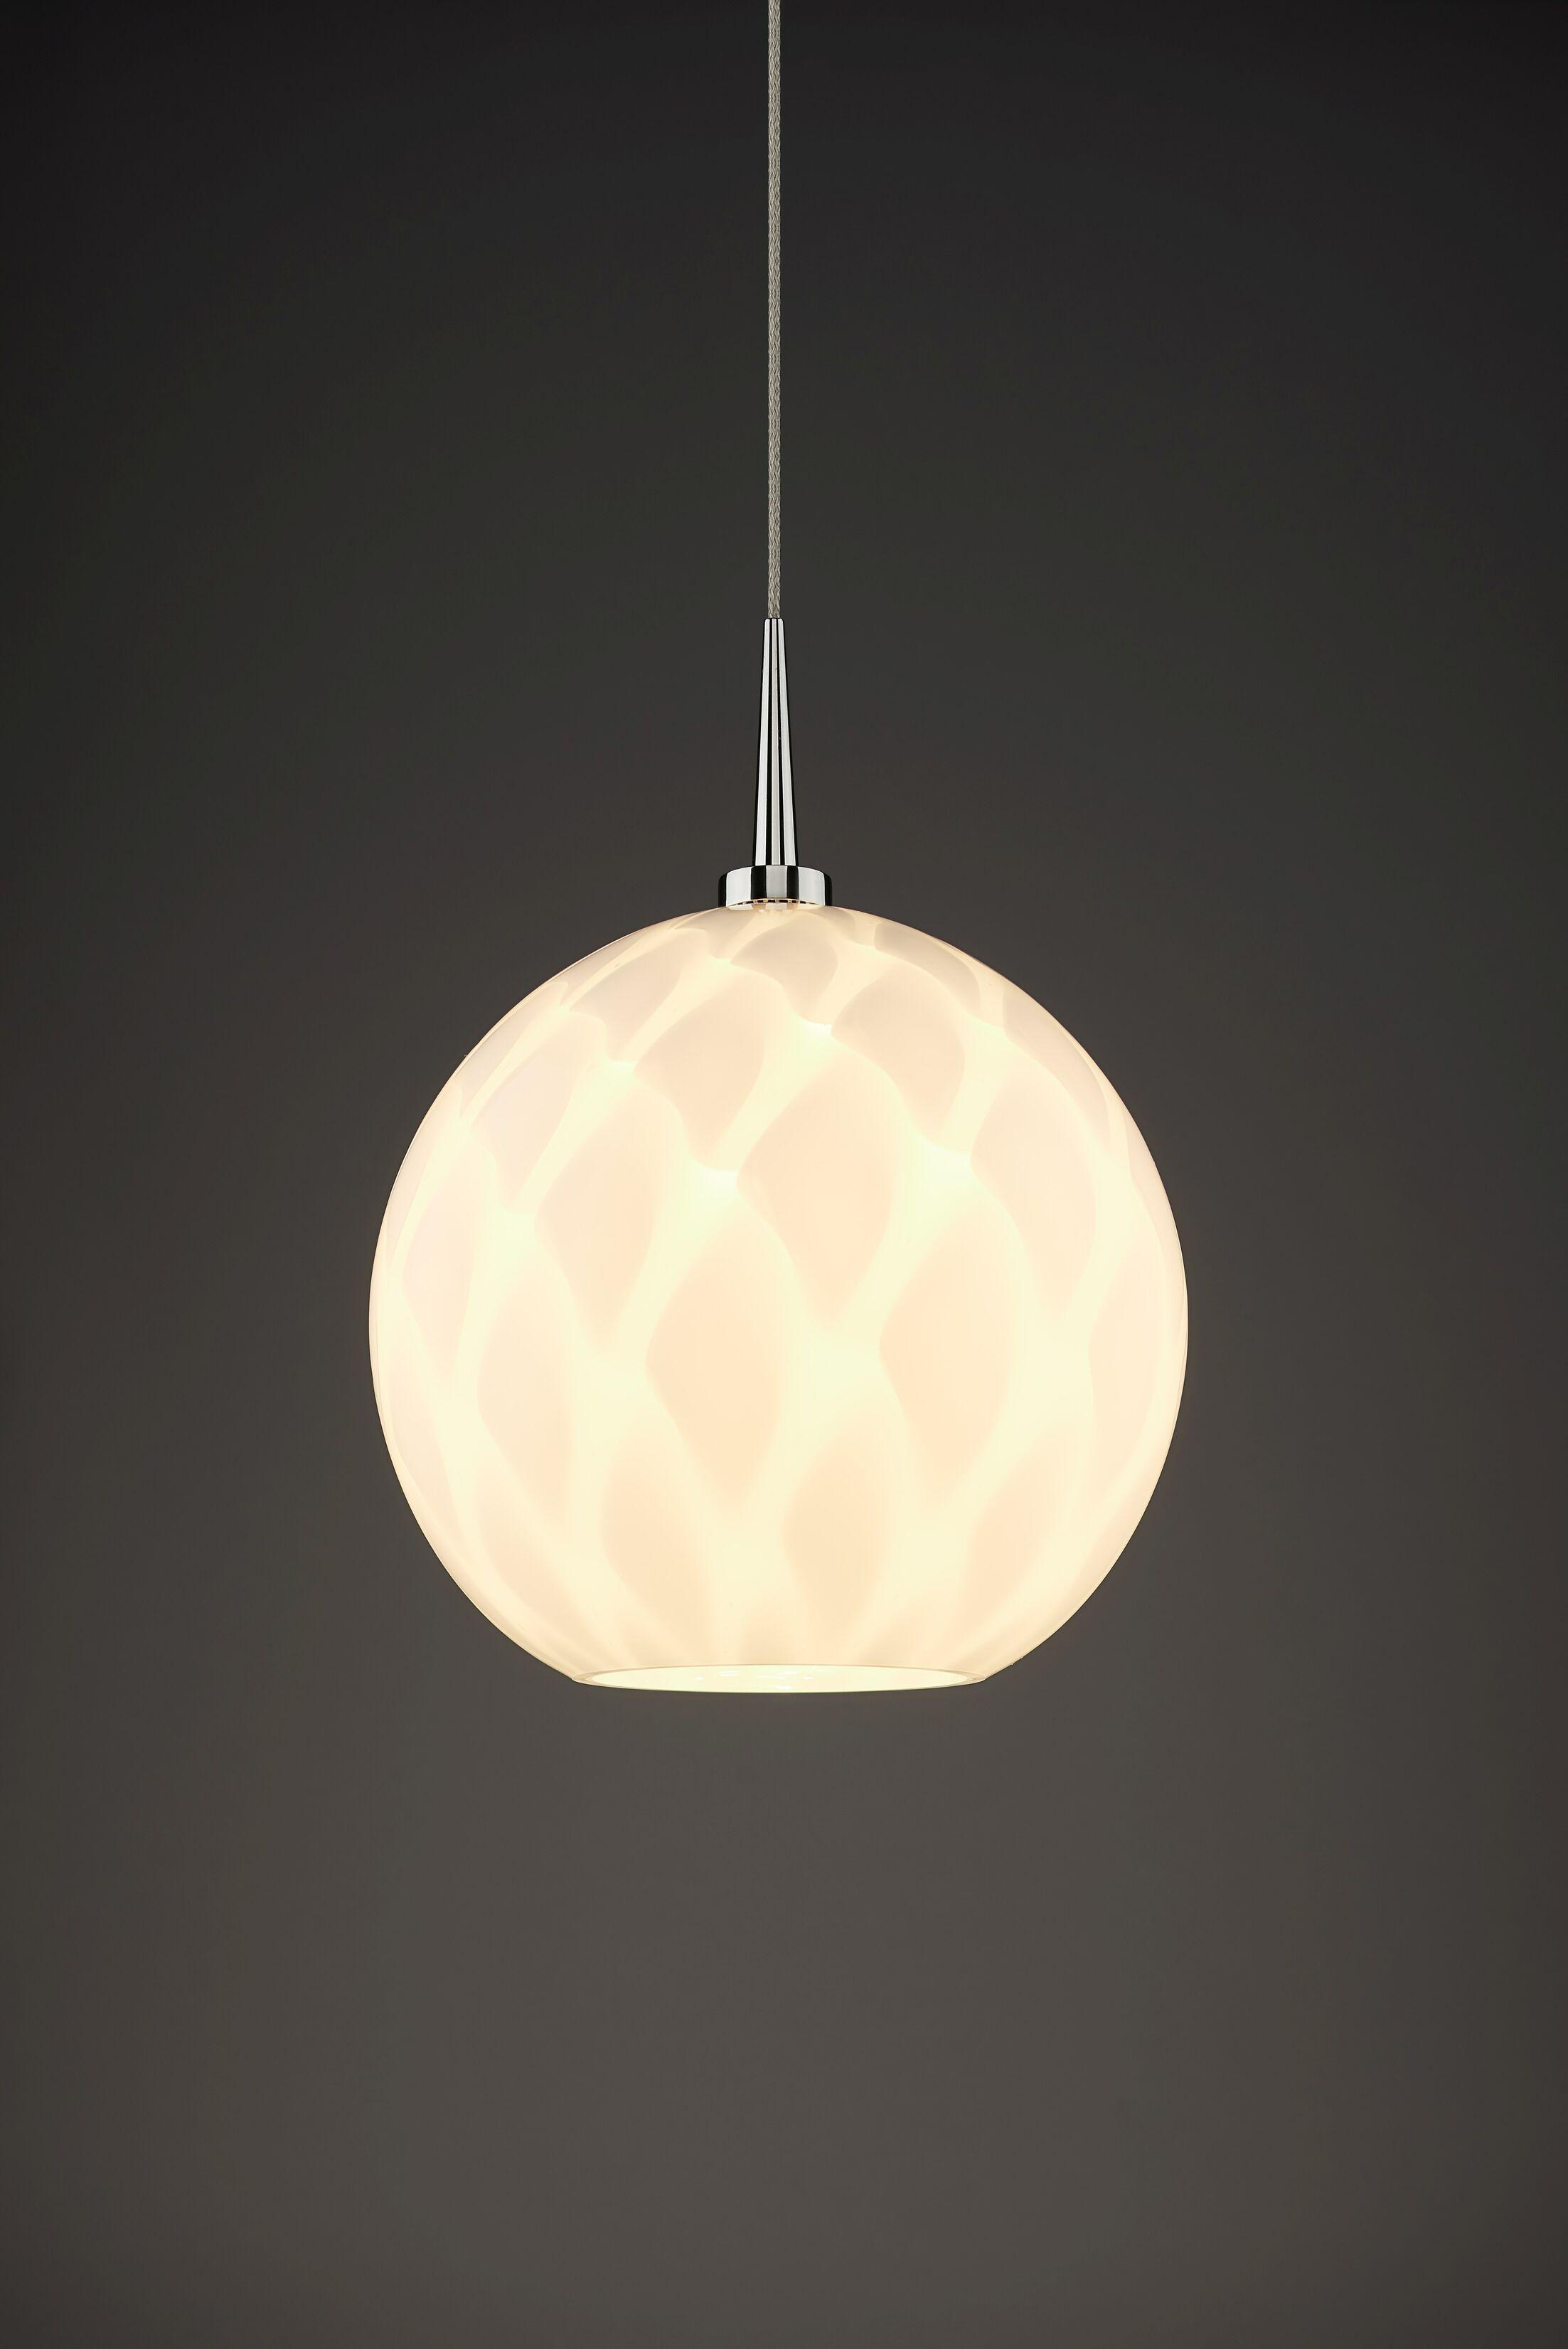 Sirena 1-Light Globe Pendant Shade Color: White, Color: Chrome